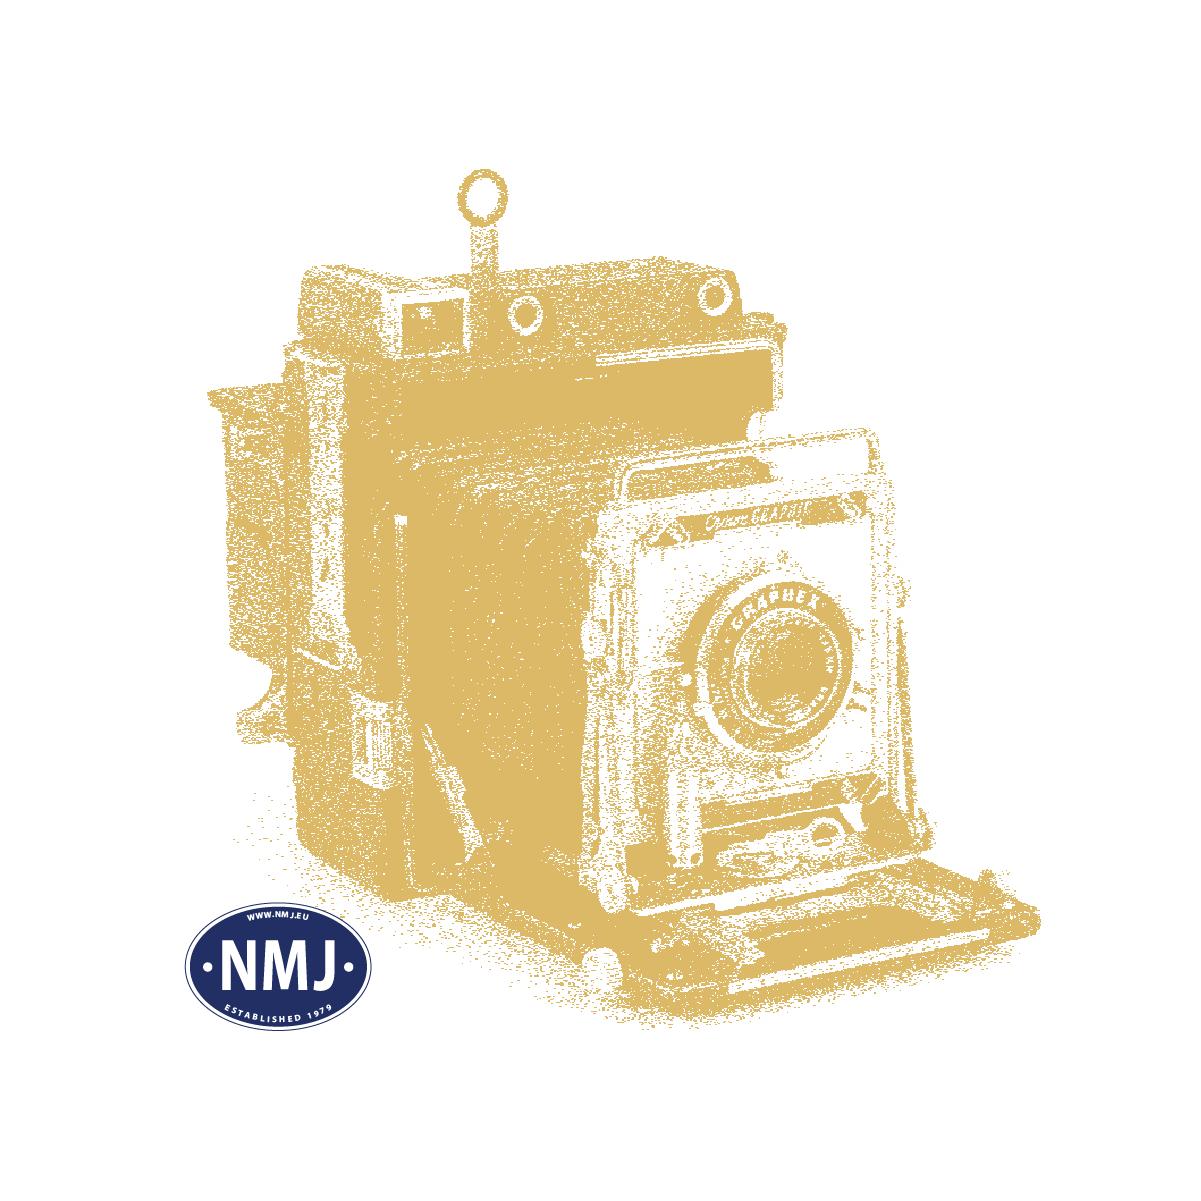 NMJT90008 - NMJ Topline NSB Di3a 605 m/ grossem Schneepflug, rot, DCC m/ Sound